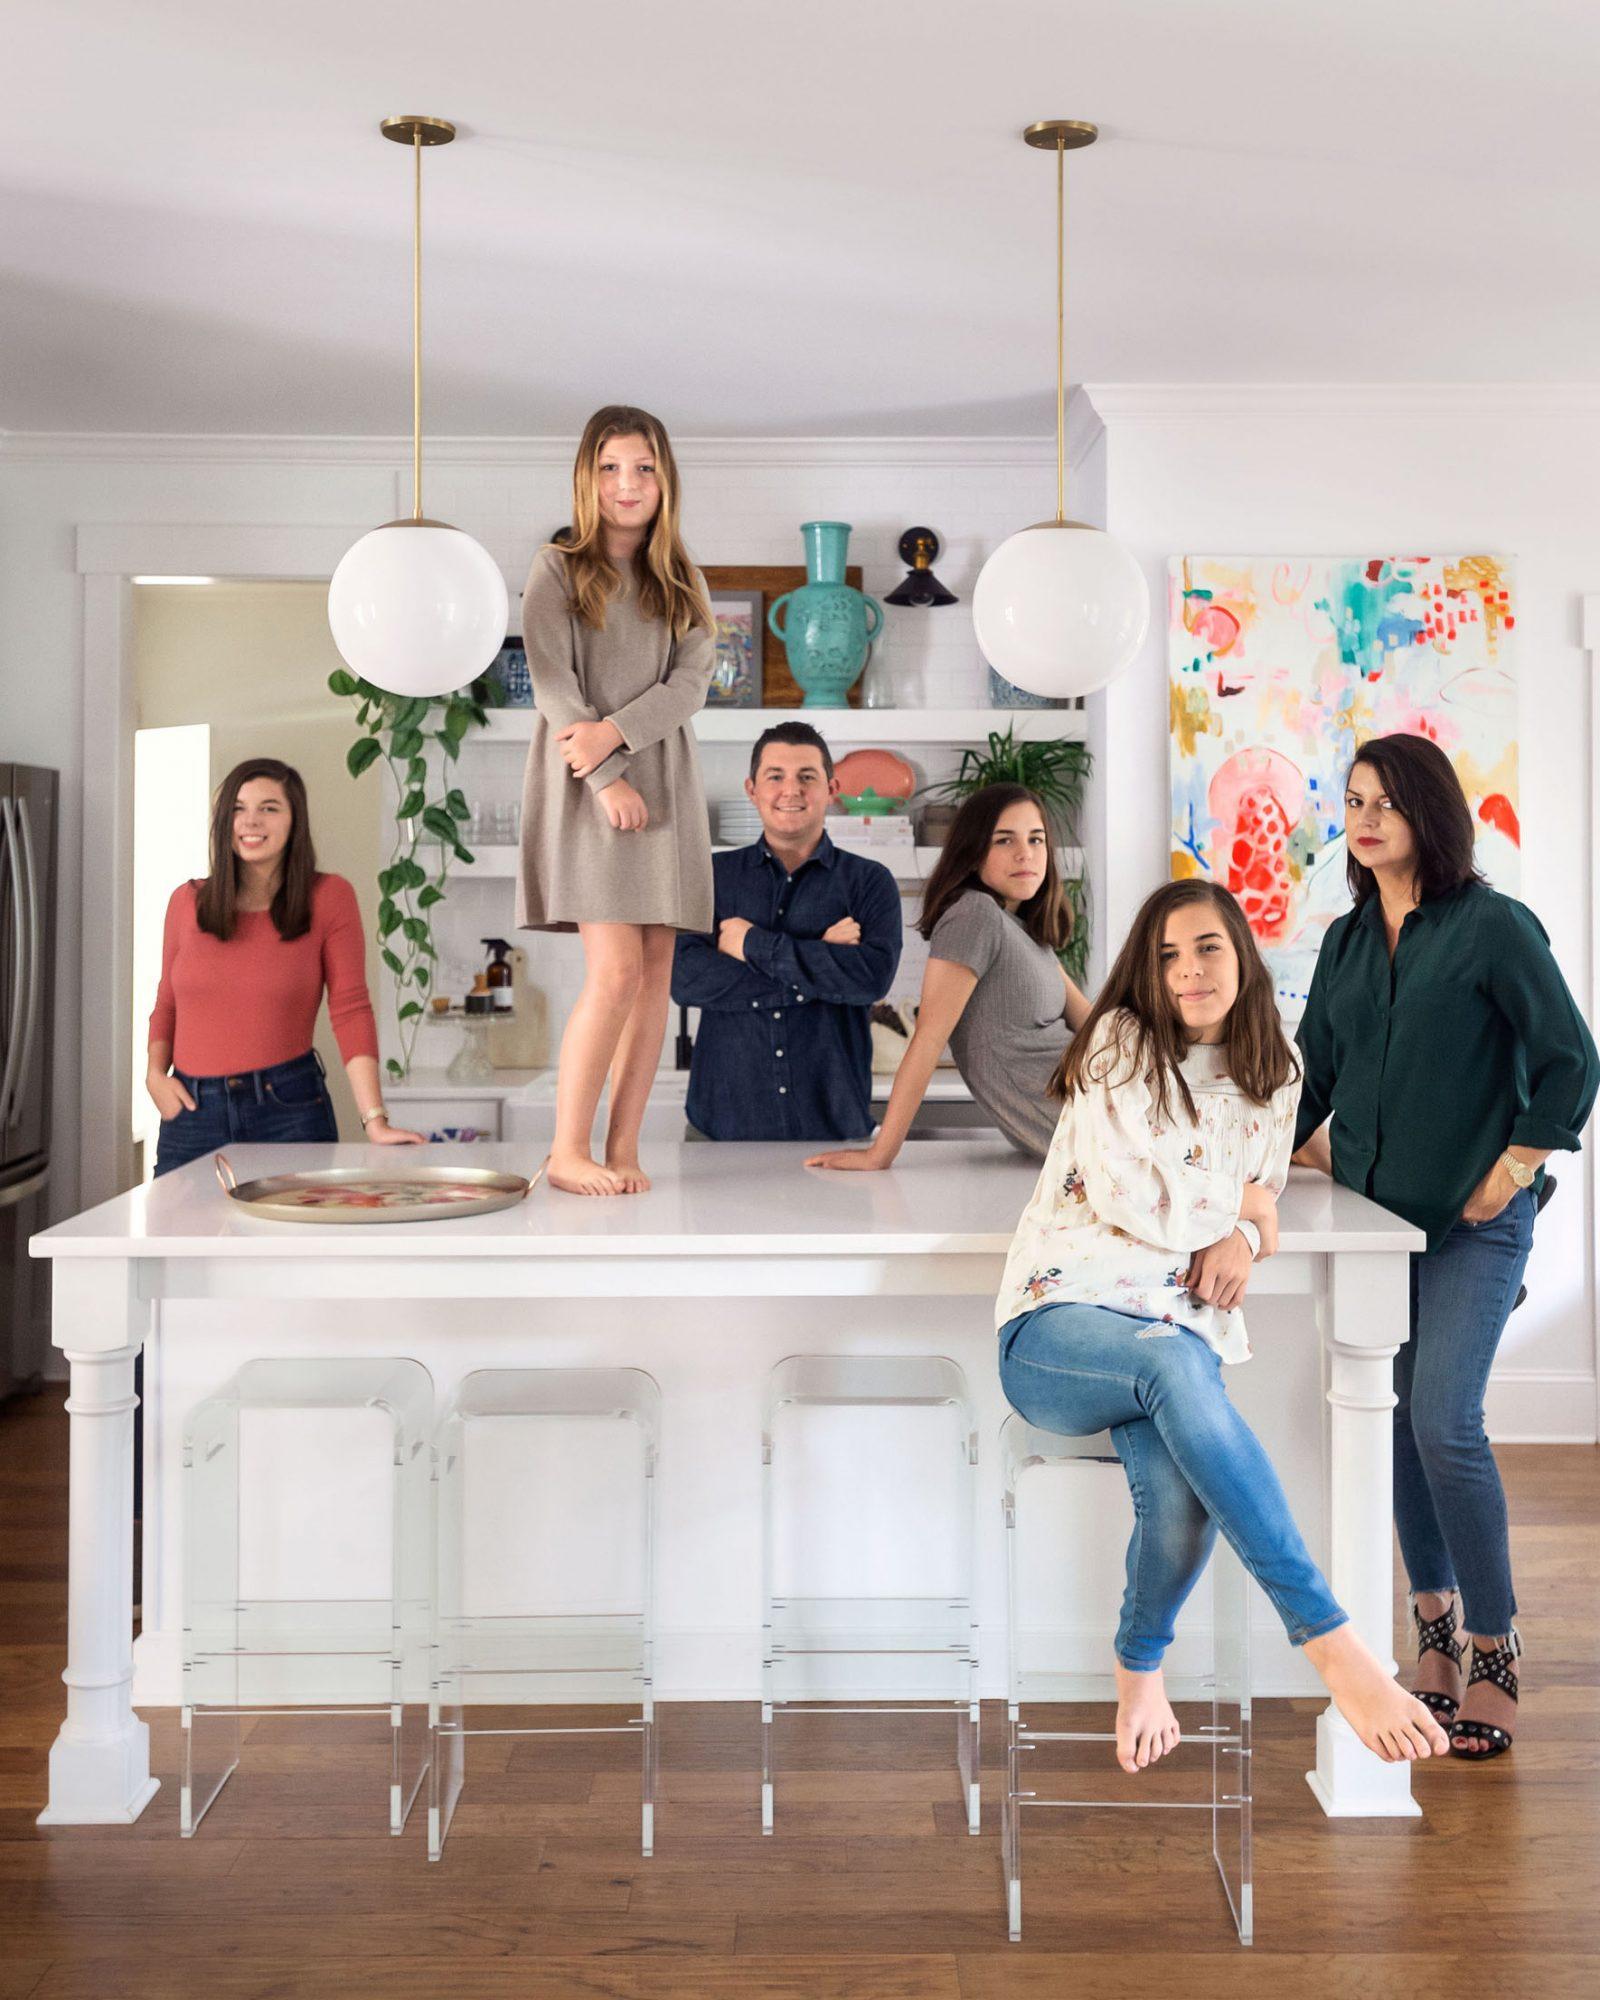 family portrait in white kitchen